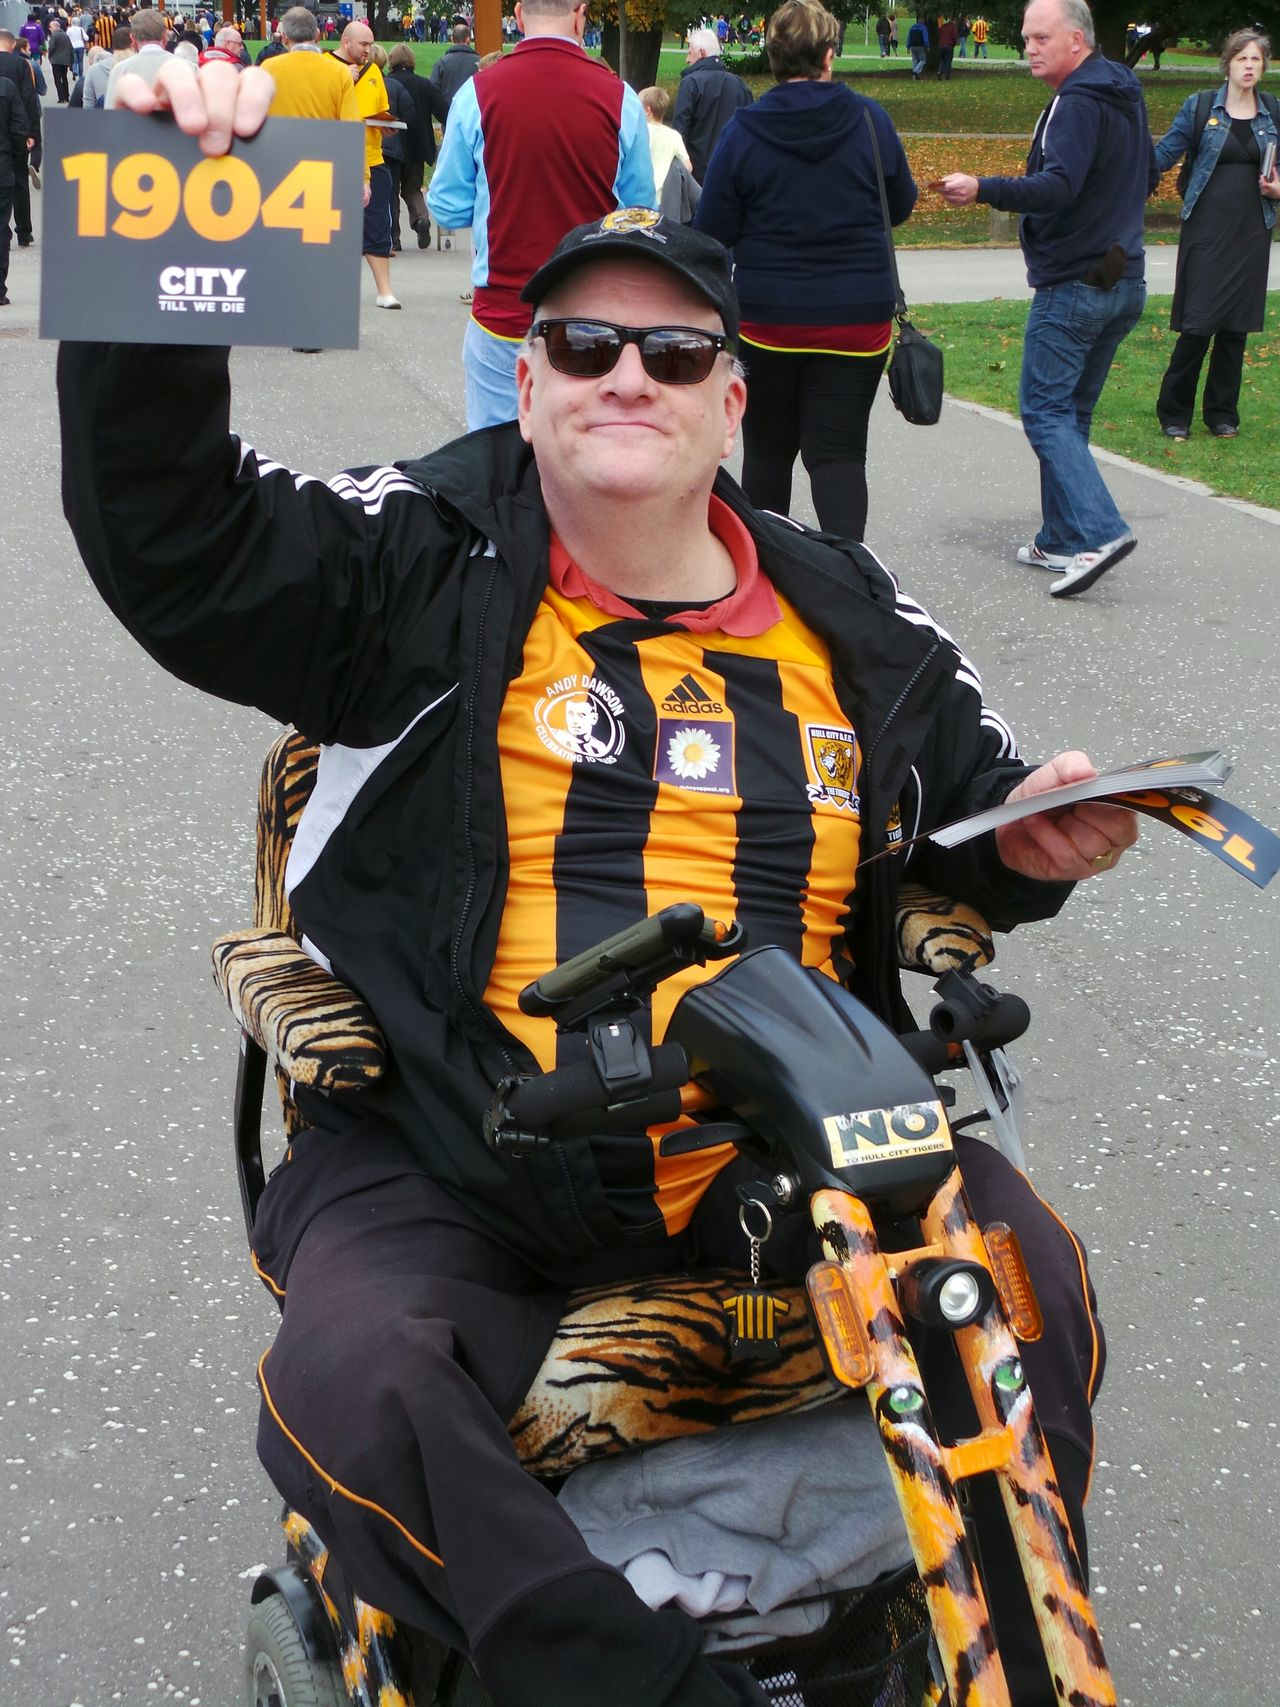 Hull Hull City Football Football Fan Protest No To Hull Tigers 1904 Kc Stadium Hull 2017 City Of Culture 2017